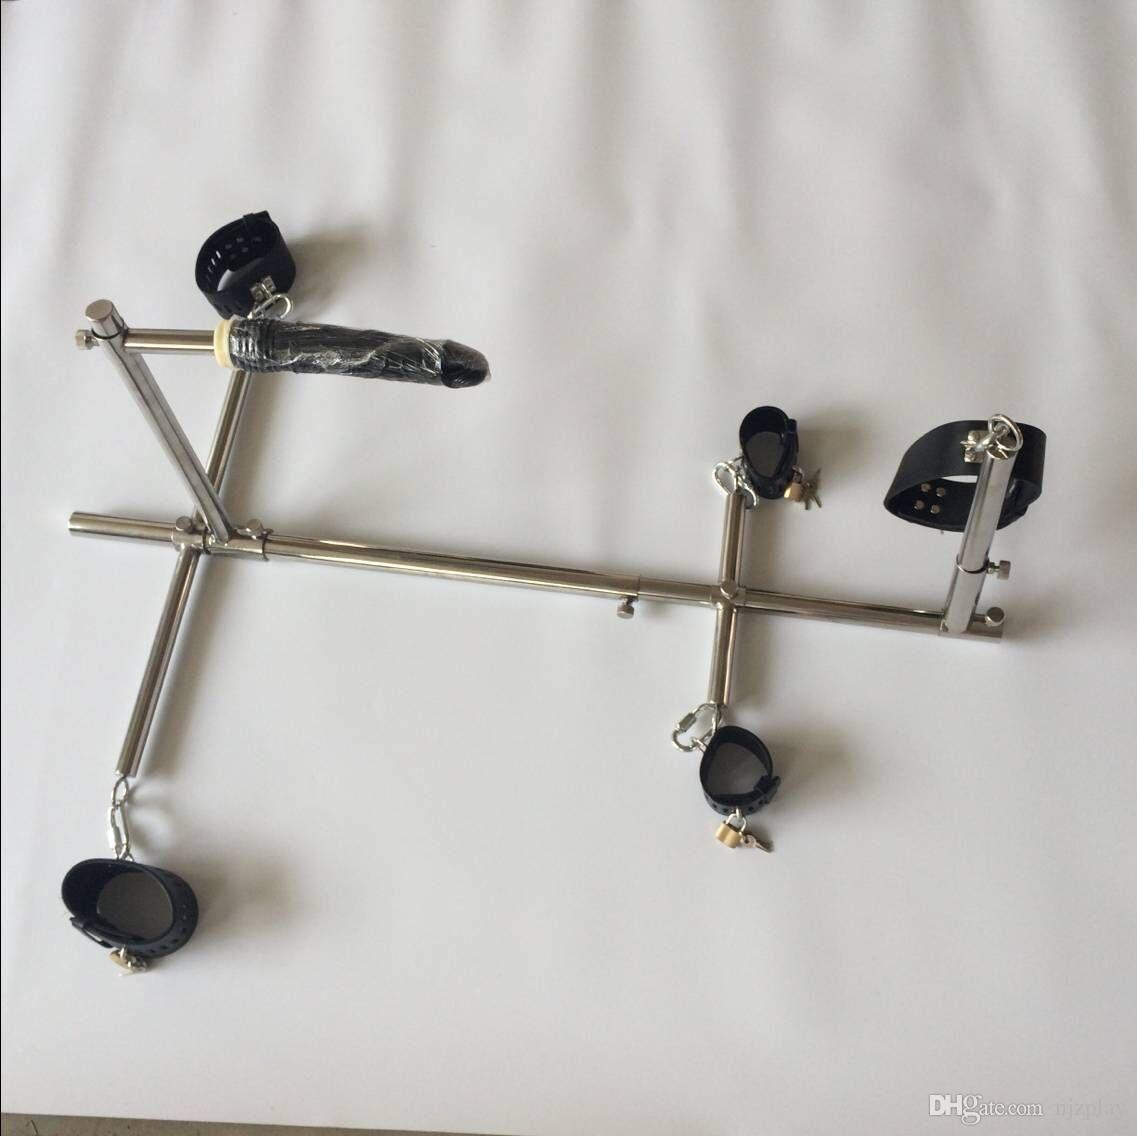 Stainless Steel Bondage Frame Dog Slaves Devices Handcuffs Shackles + Ankle Cuffs + Collor Bondage Restraints Sex BDSM Toys for Men/ Female